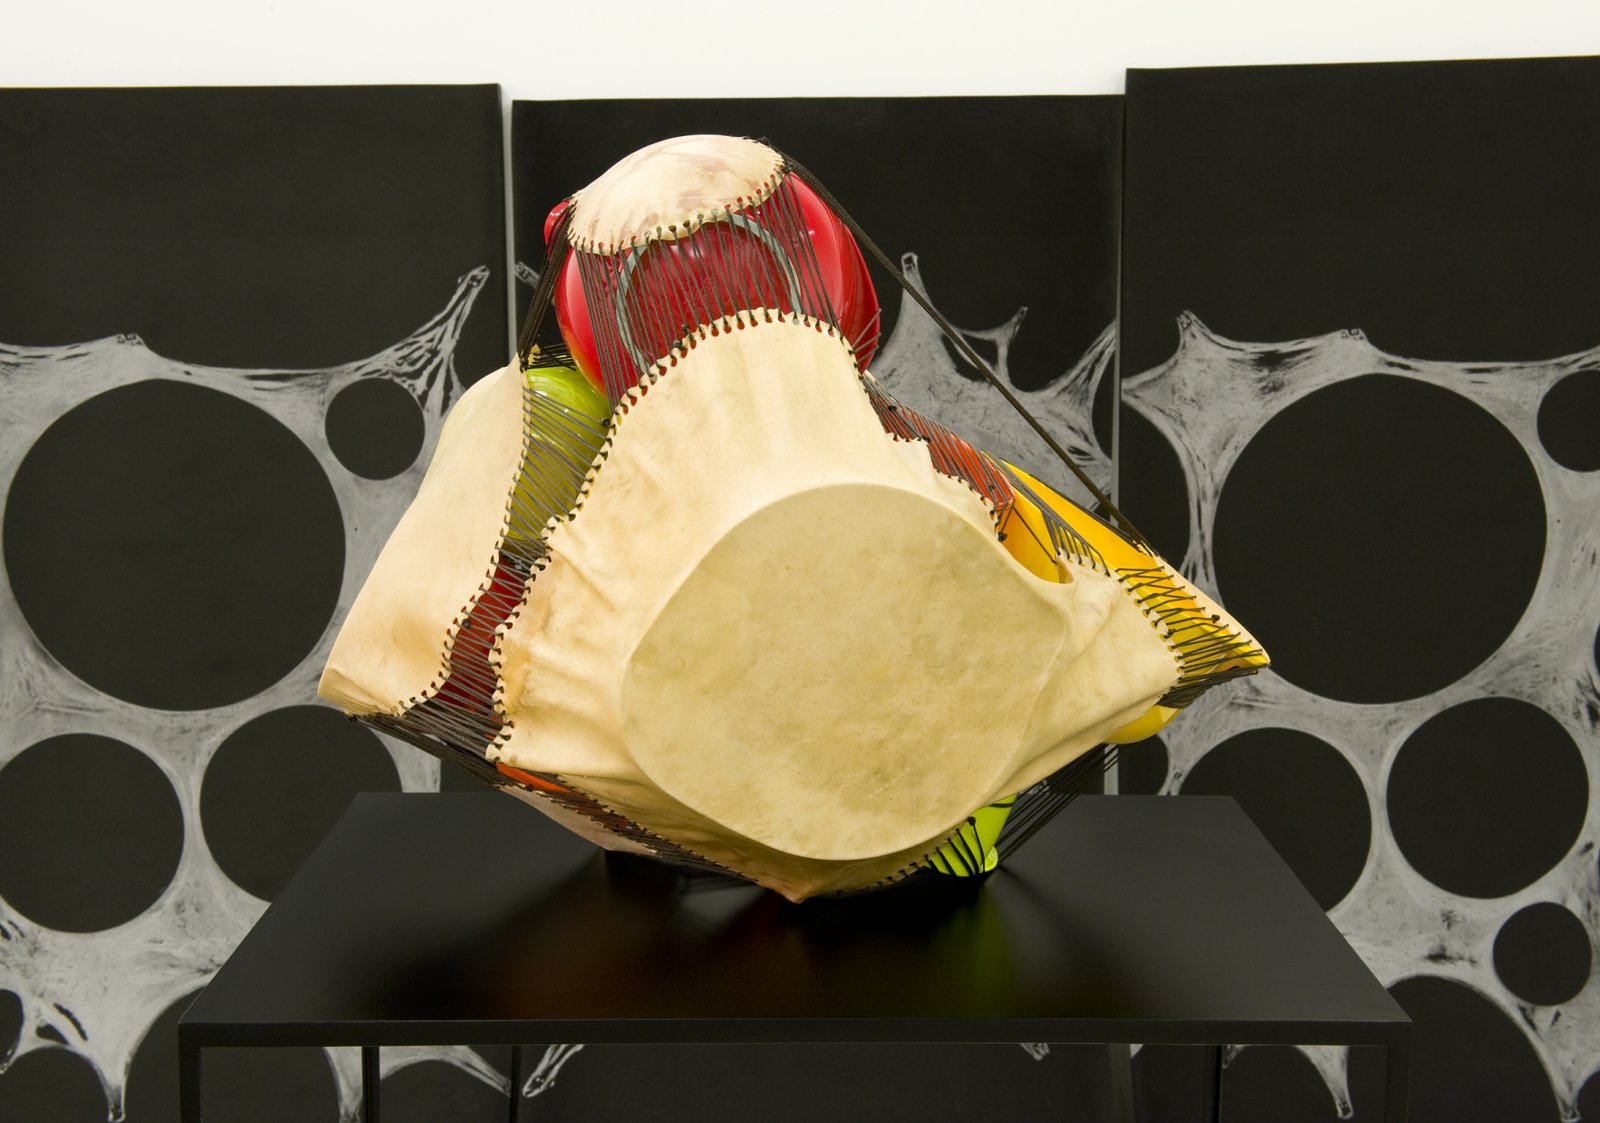 Brian Jungen,Subject, Silver, Prism(detail), 2011,foam, silver relief ink, plastic bowls, deer hide, tarred twine, steel, 78 x 120 x 300 in. (198 x 305 x 762 cm)